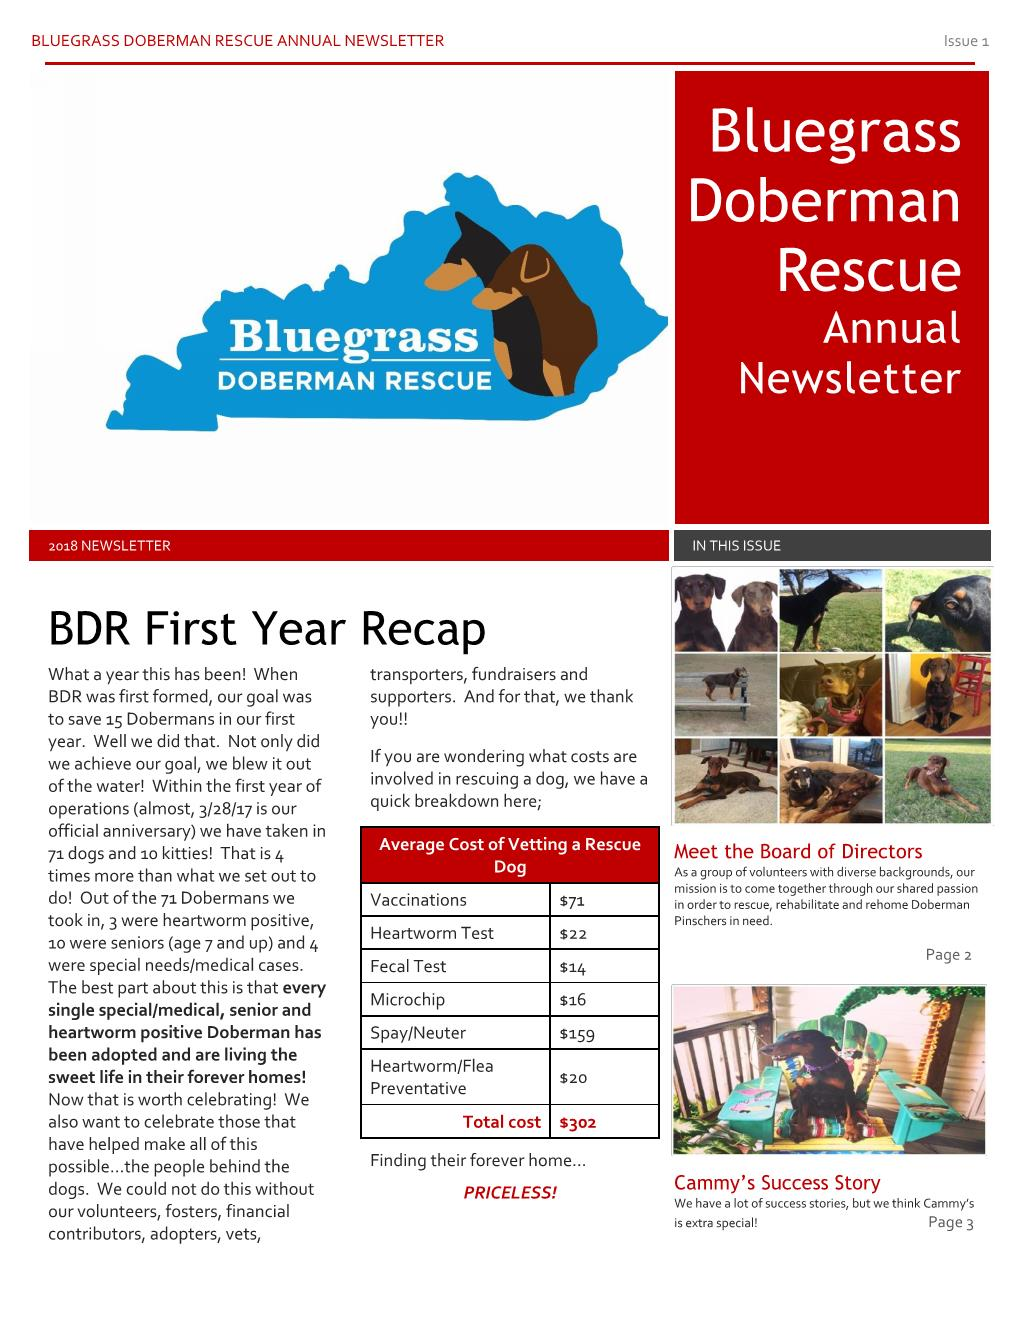 2018 BDR Newsletter Page 001